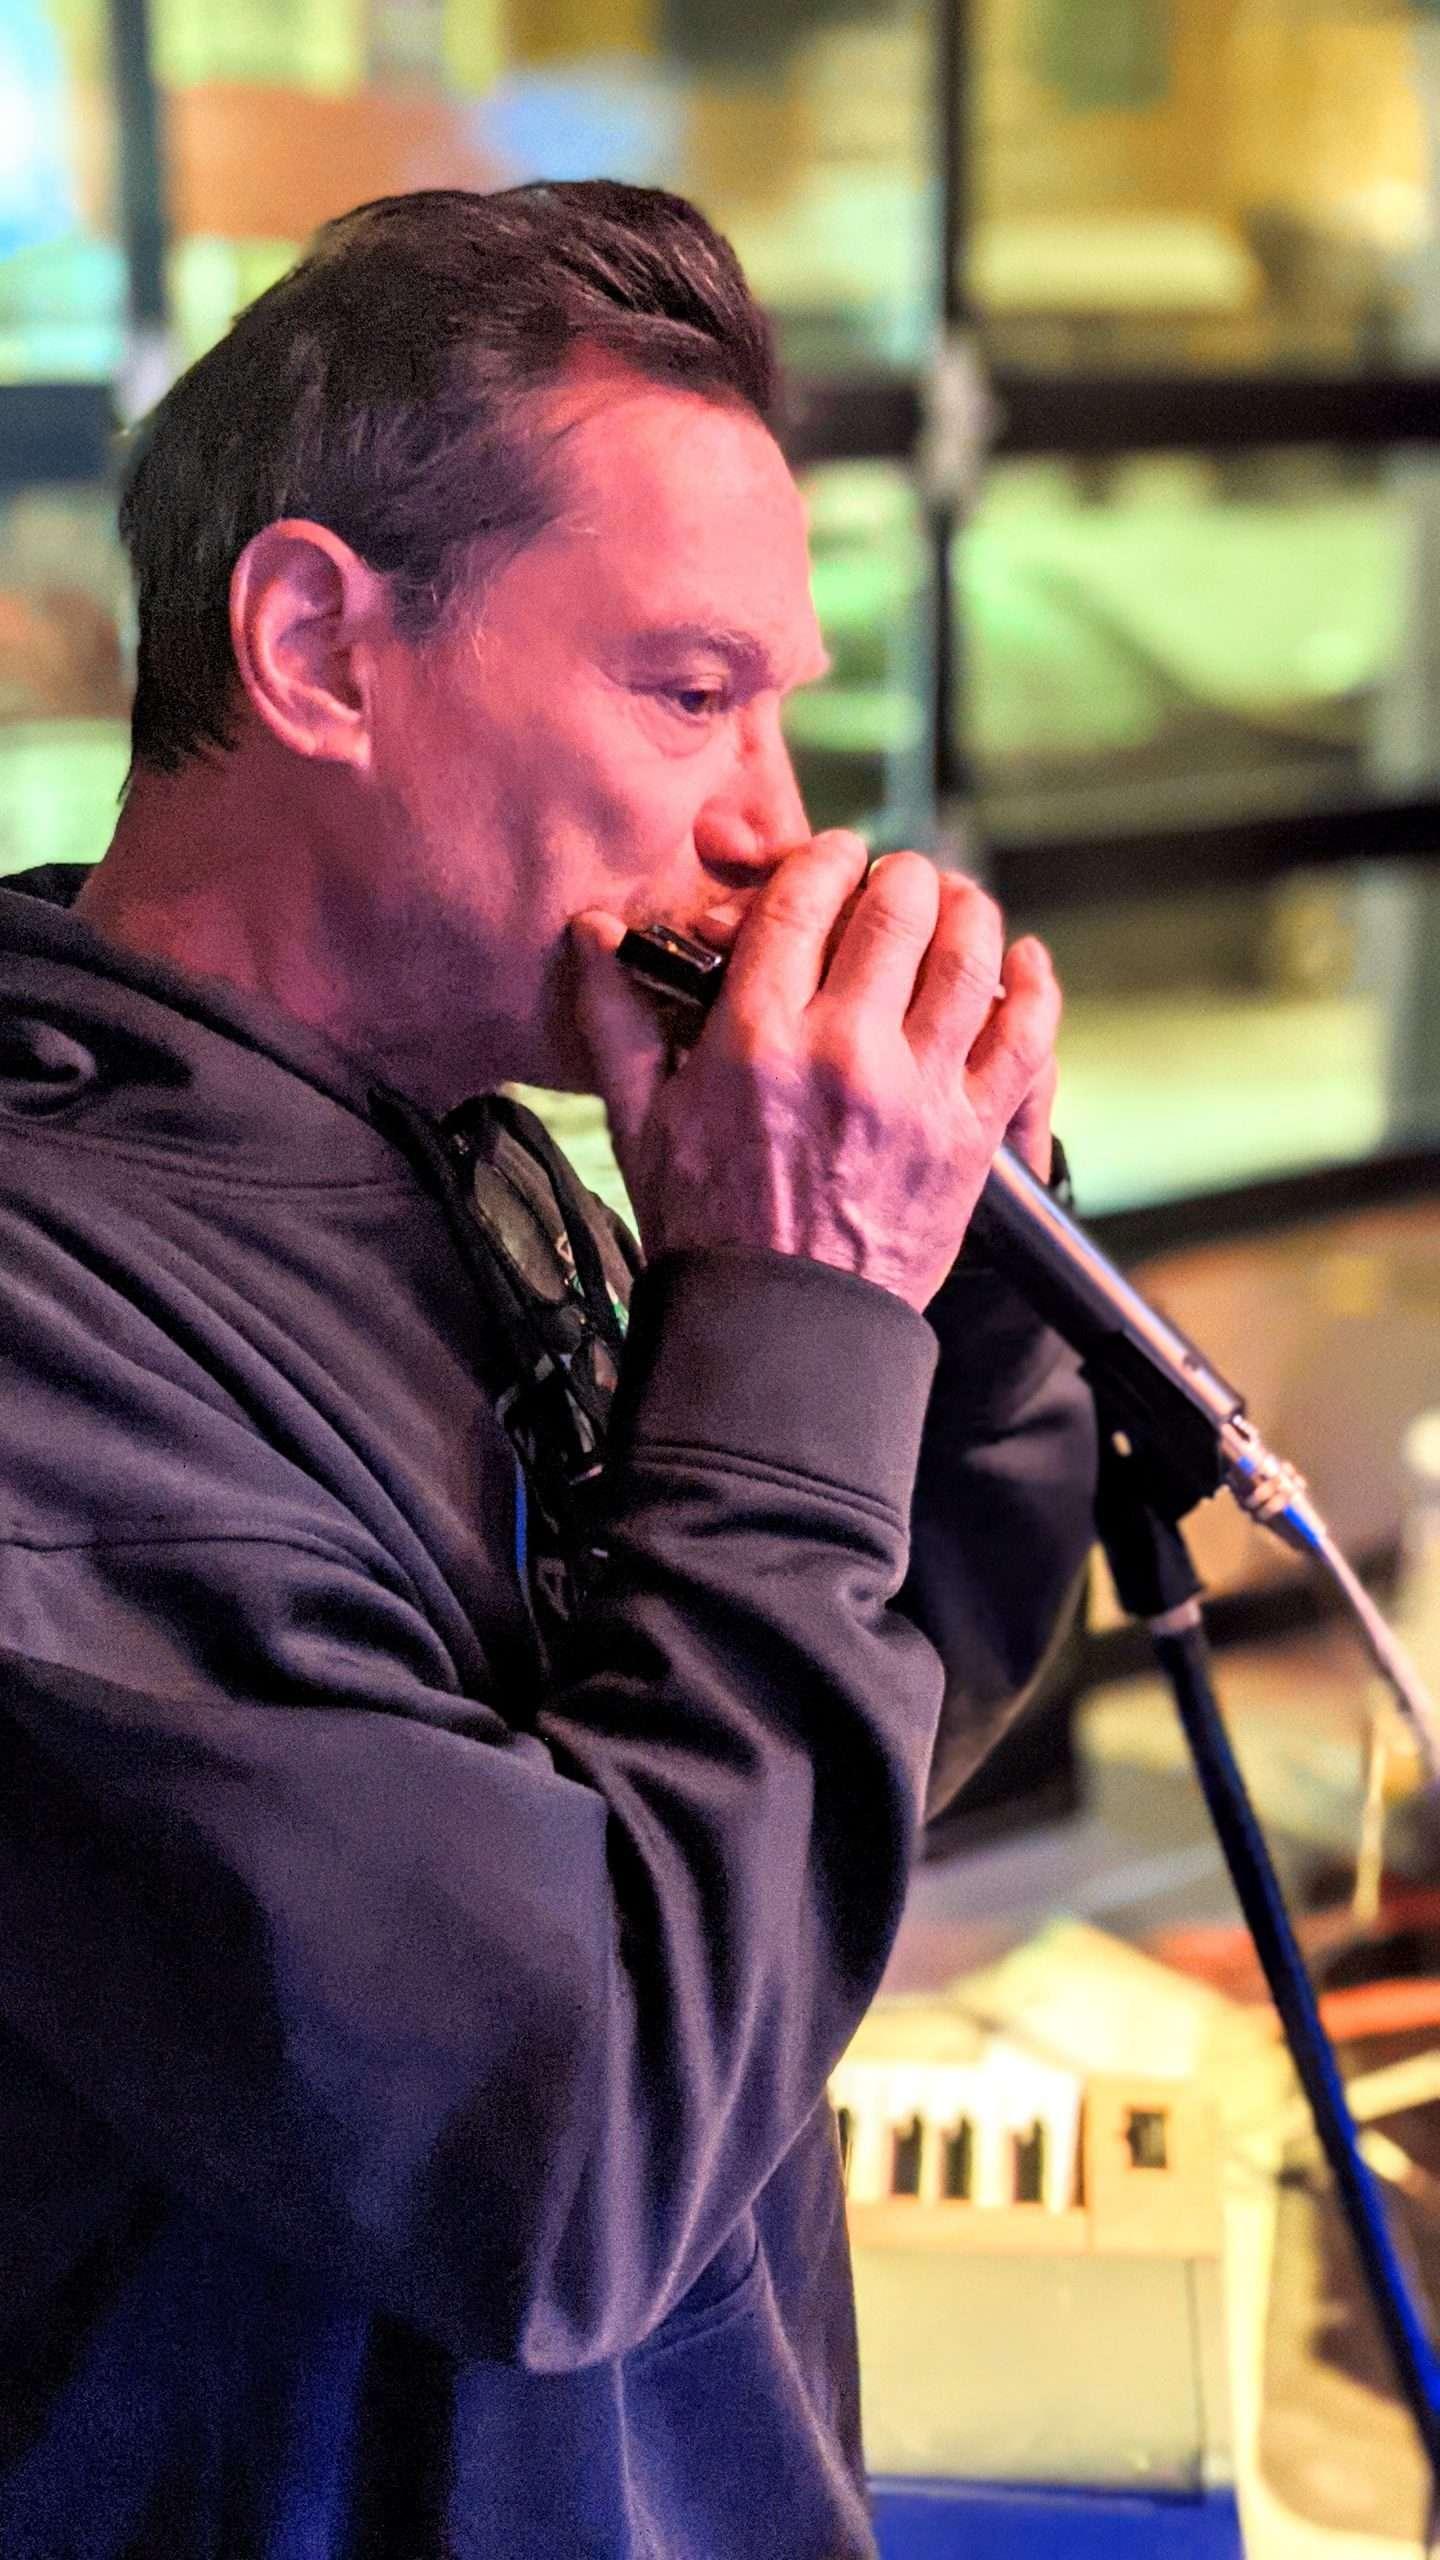 Brian's Open Mic Experiences At Johnny's Blitz Bar & Grill 35